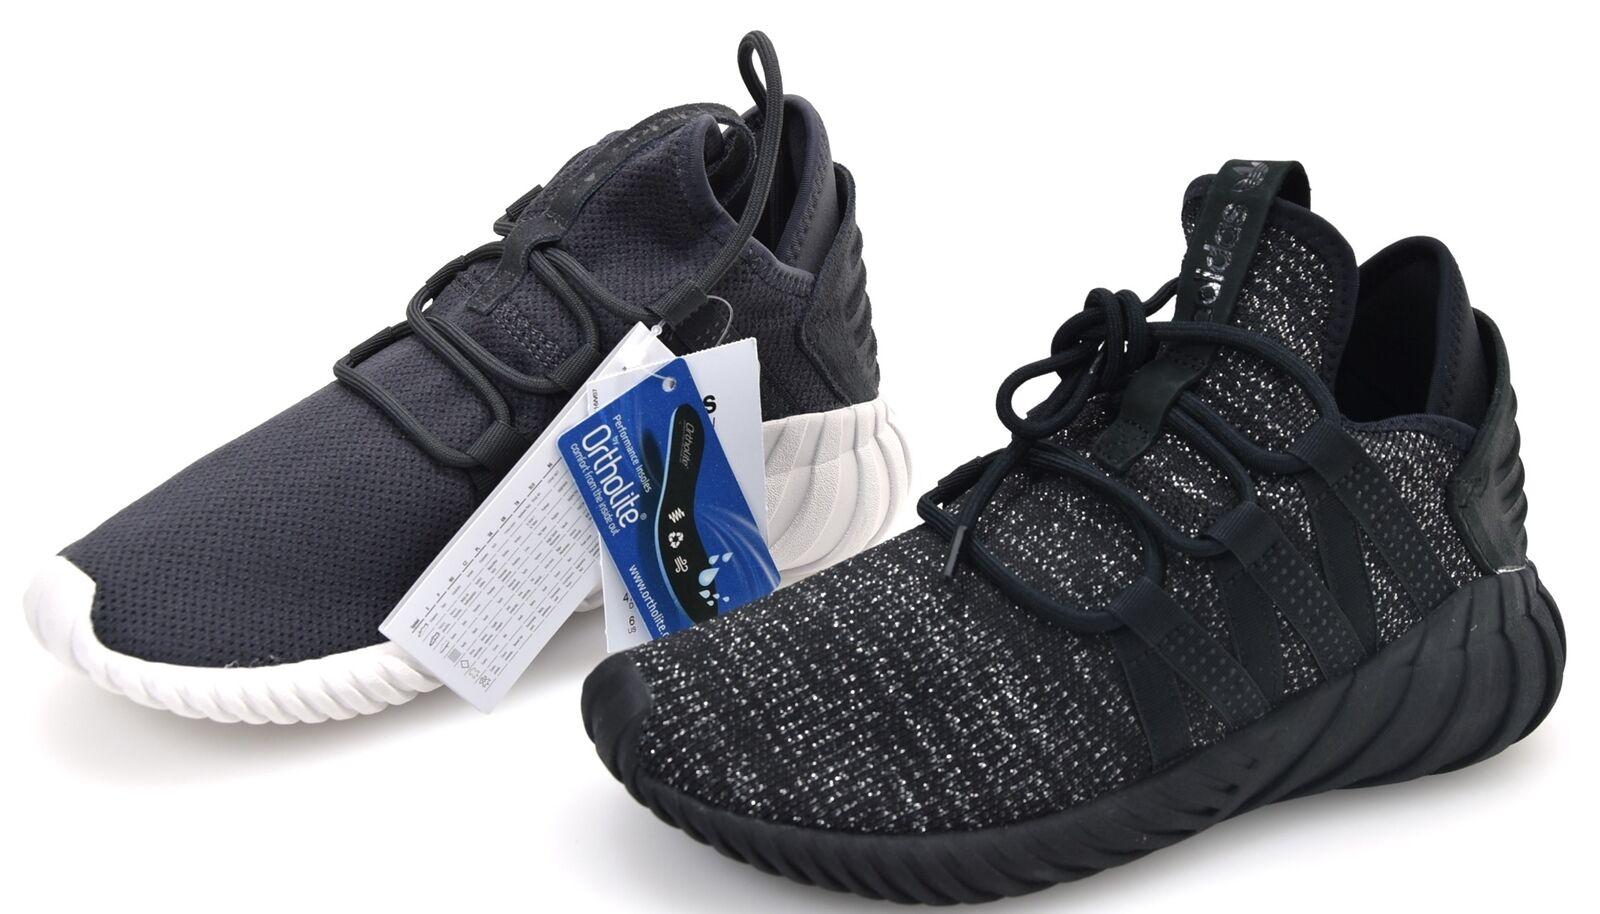 ADIDAS WOMAN SPORTS baskets RUNNING chaussures CODE BZ0631 - BZ0629 TUBULAR DAWN W